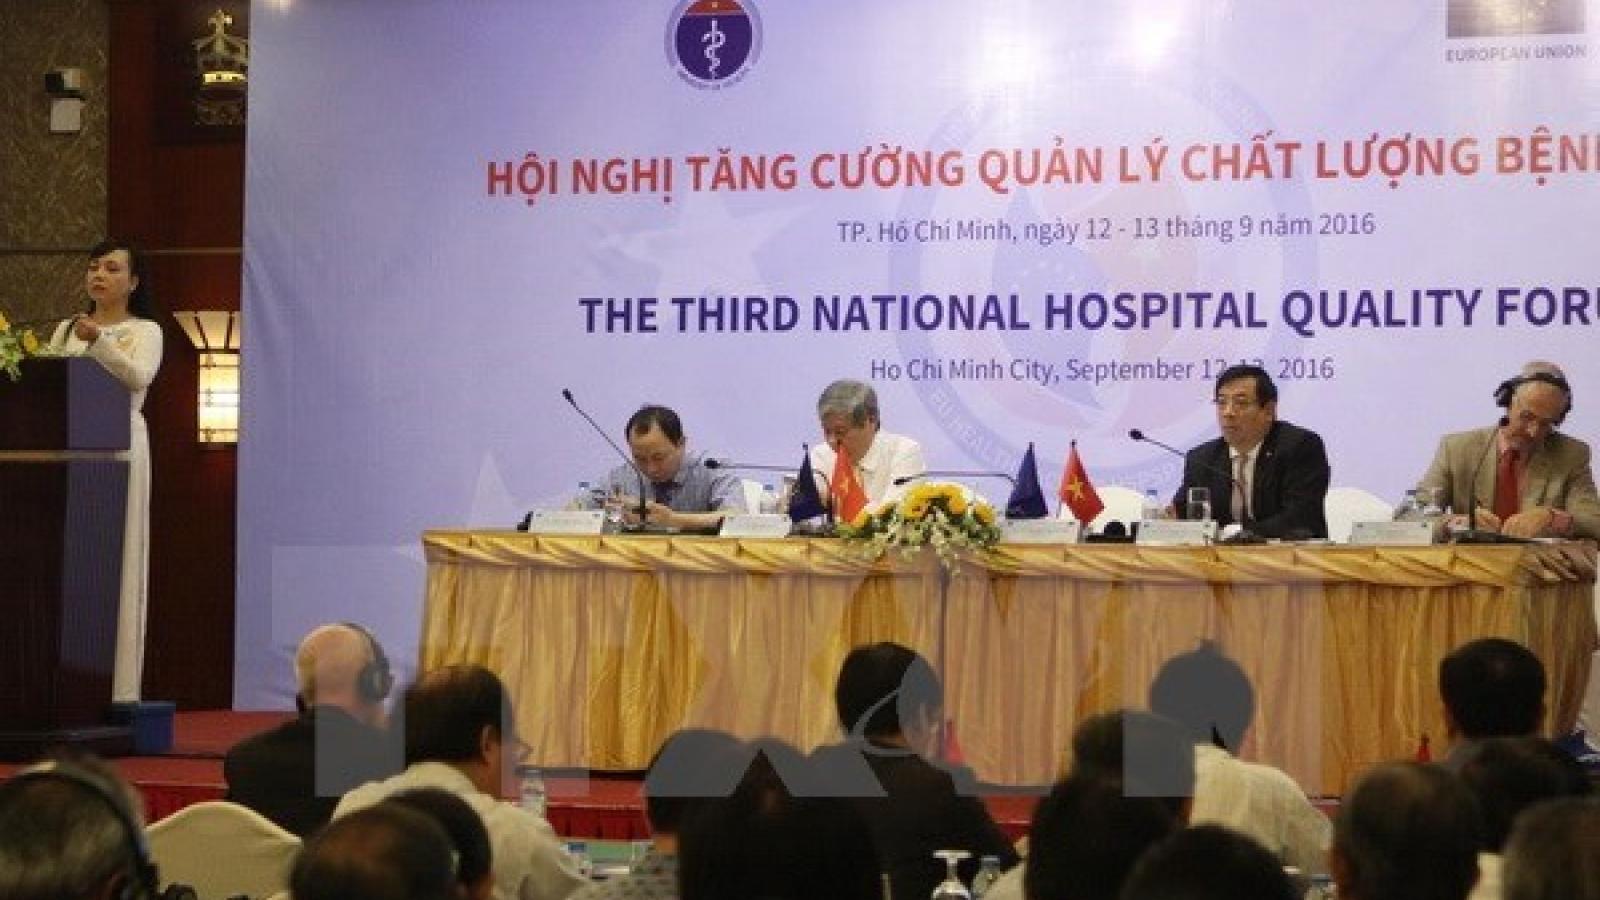 Hospital quality improvement discussed at seminar